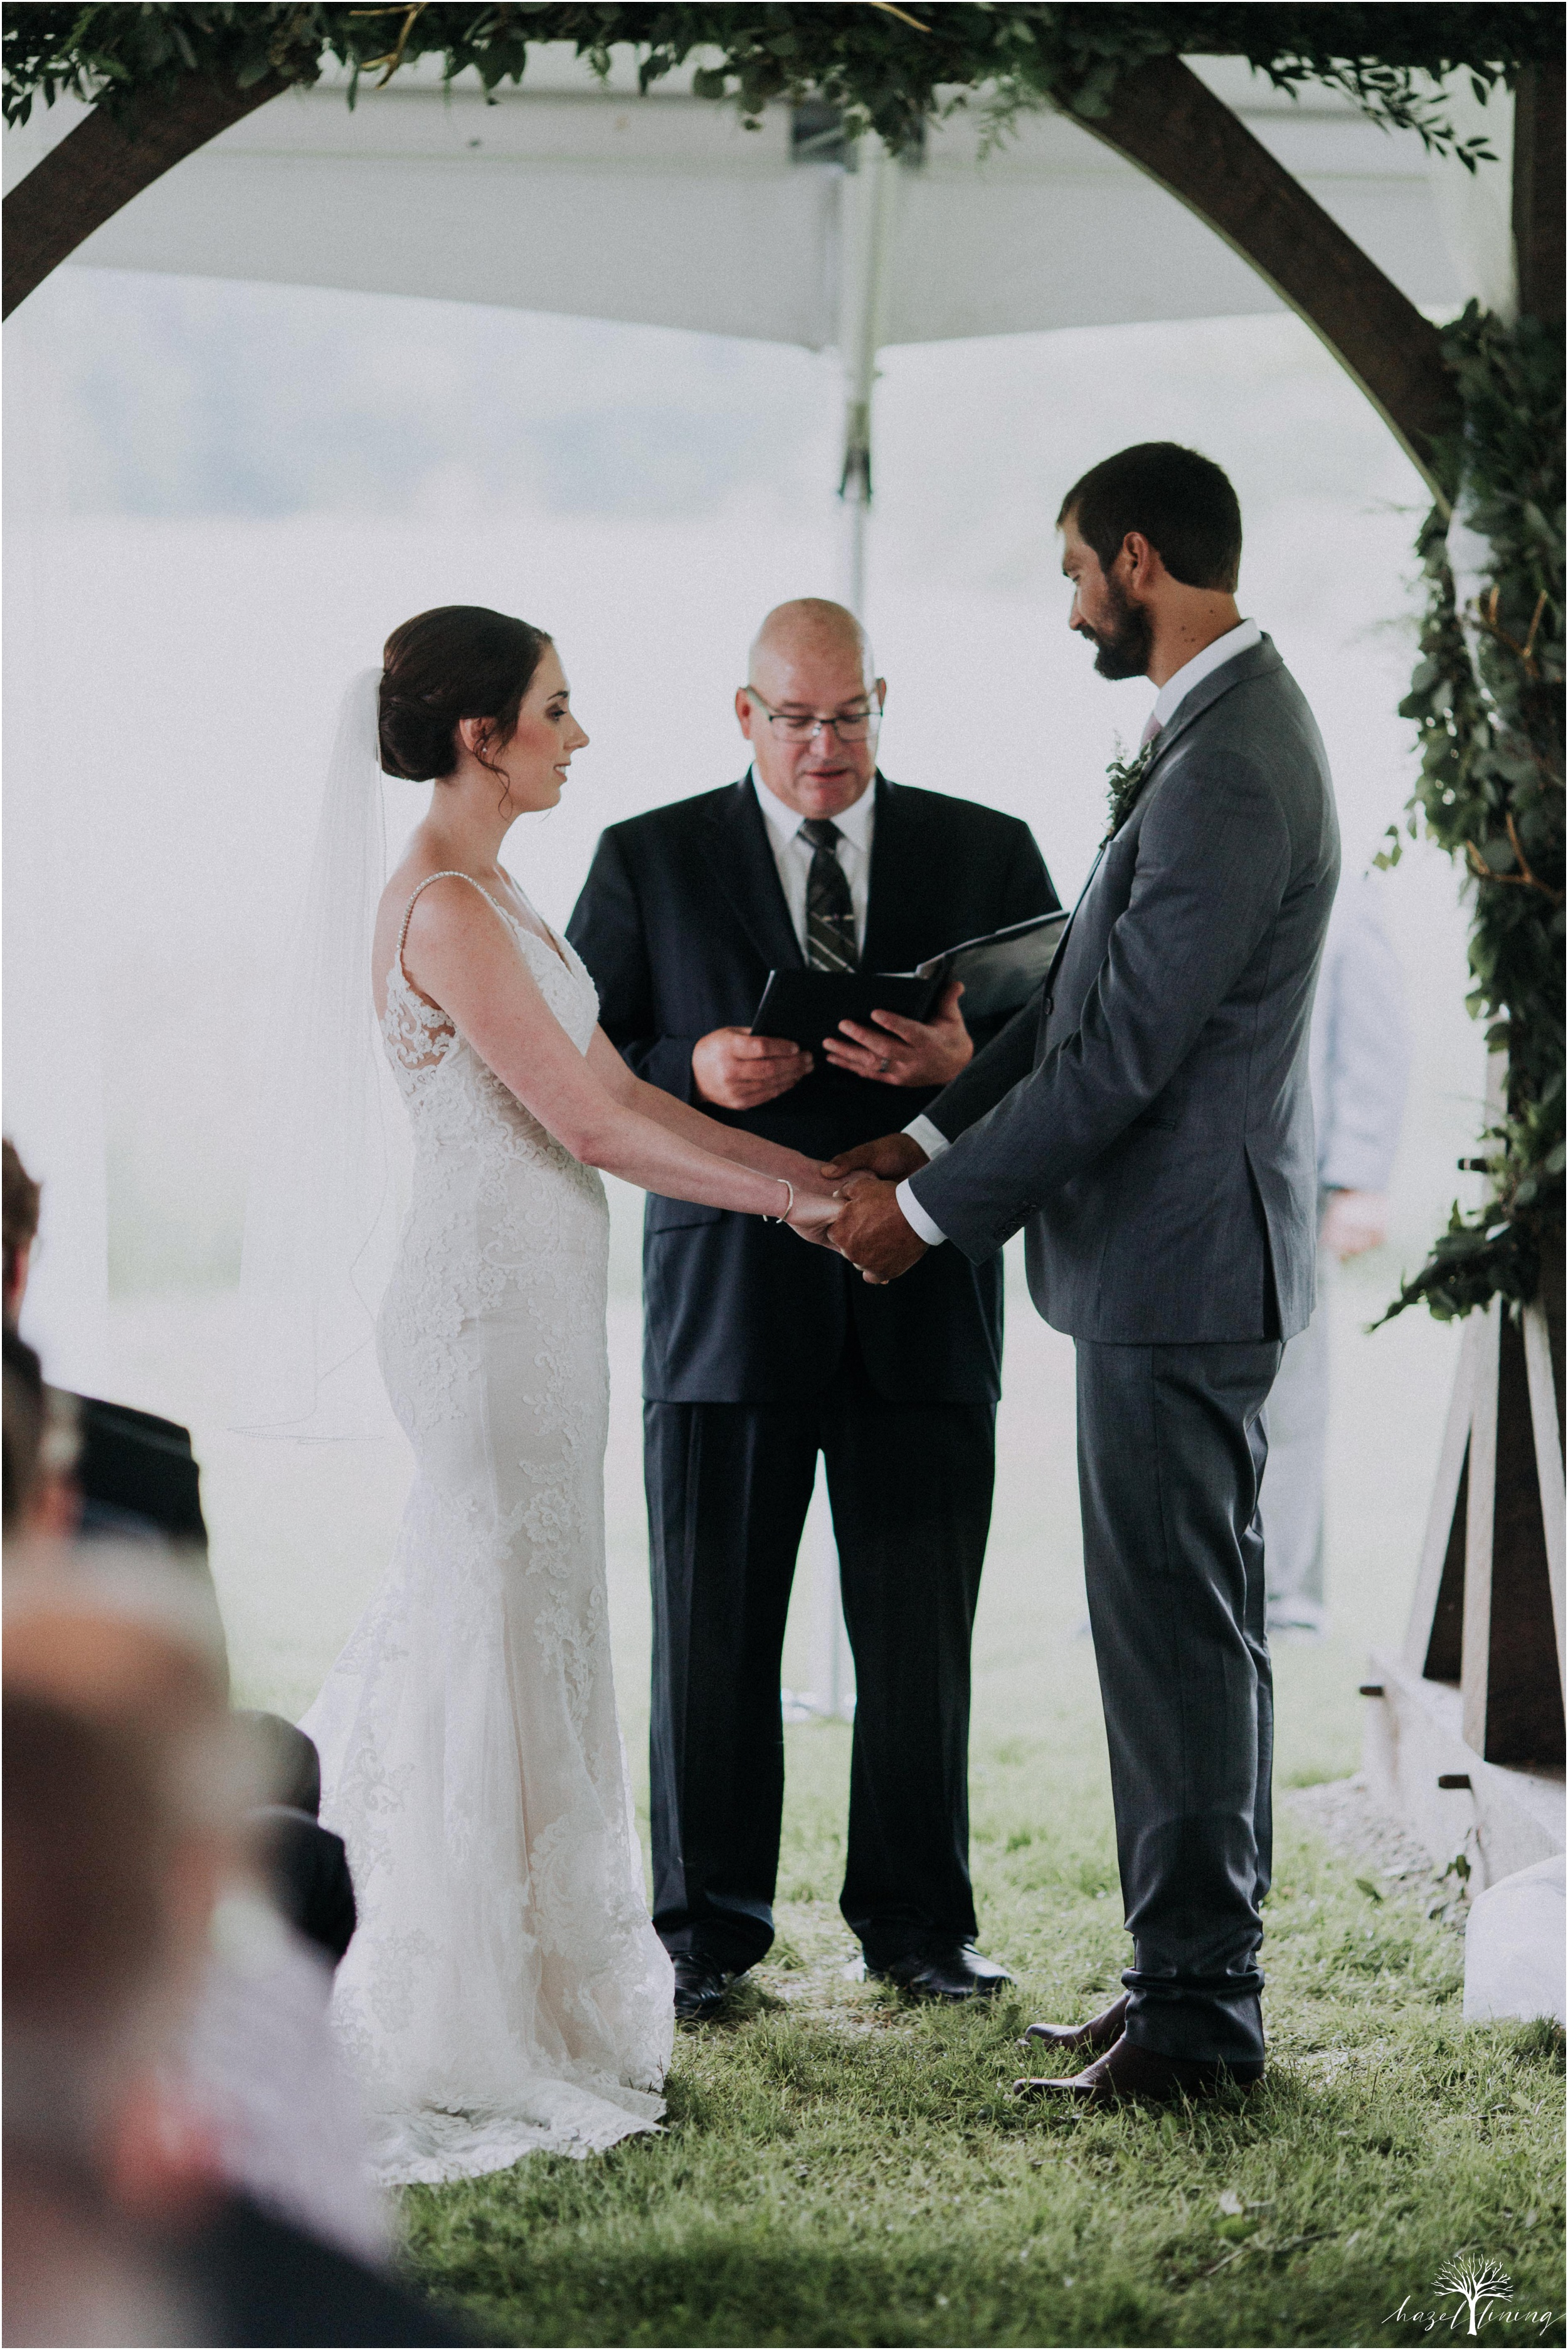 hazel-lining-travel-wedding-elopement-photography-lisa-landon-shoemaker-the-farm-bakery-and-events-bucks-county-quakertown-pennsylvania-summer-country-outdoor-farm-wedding_0058.jpg